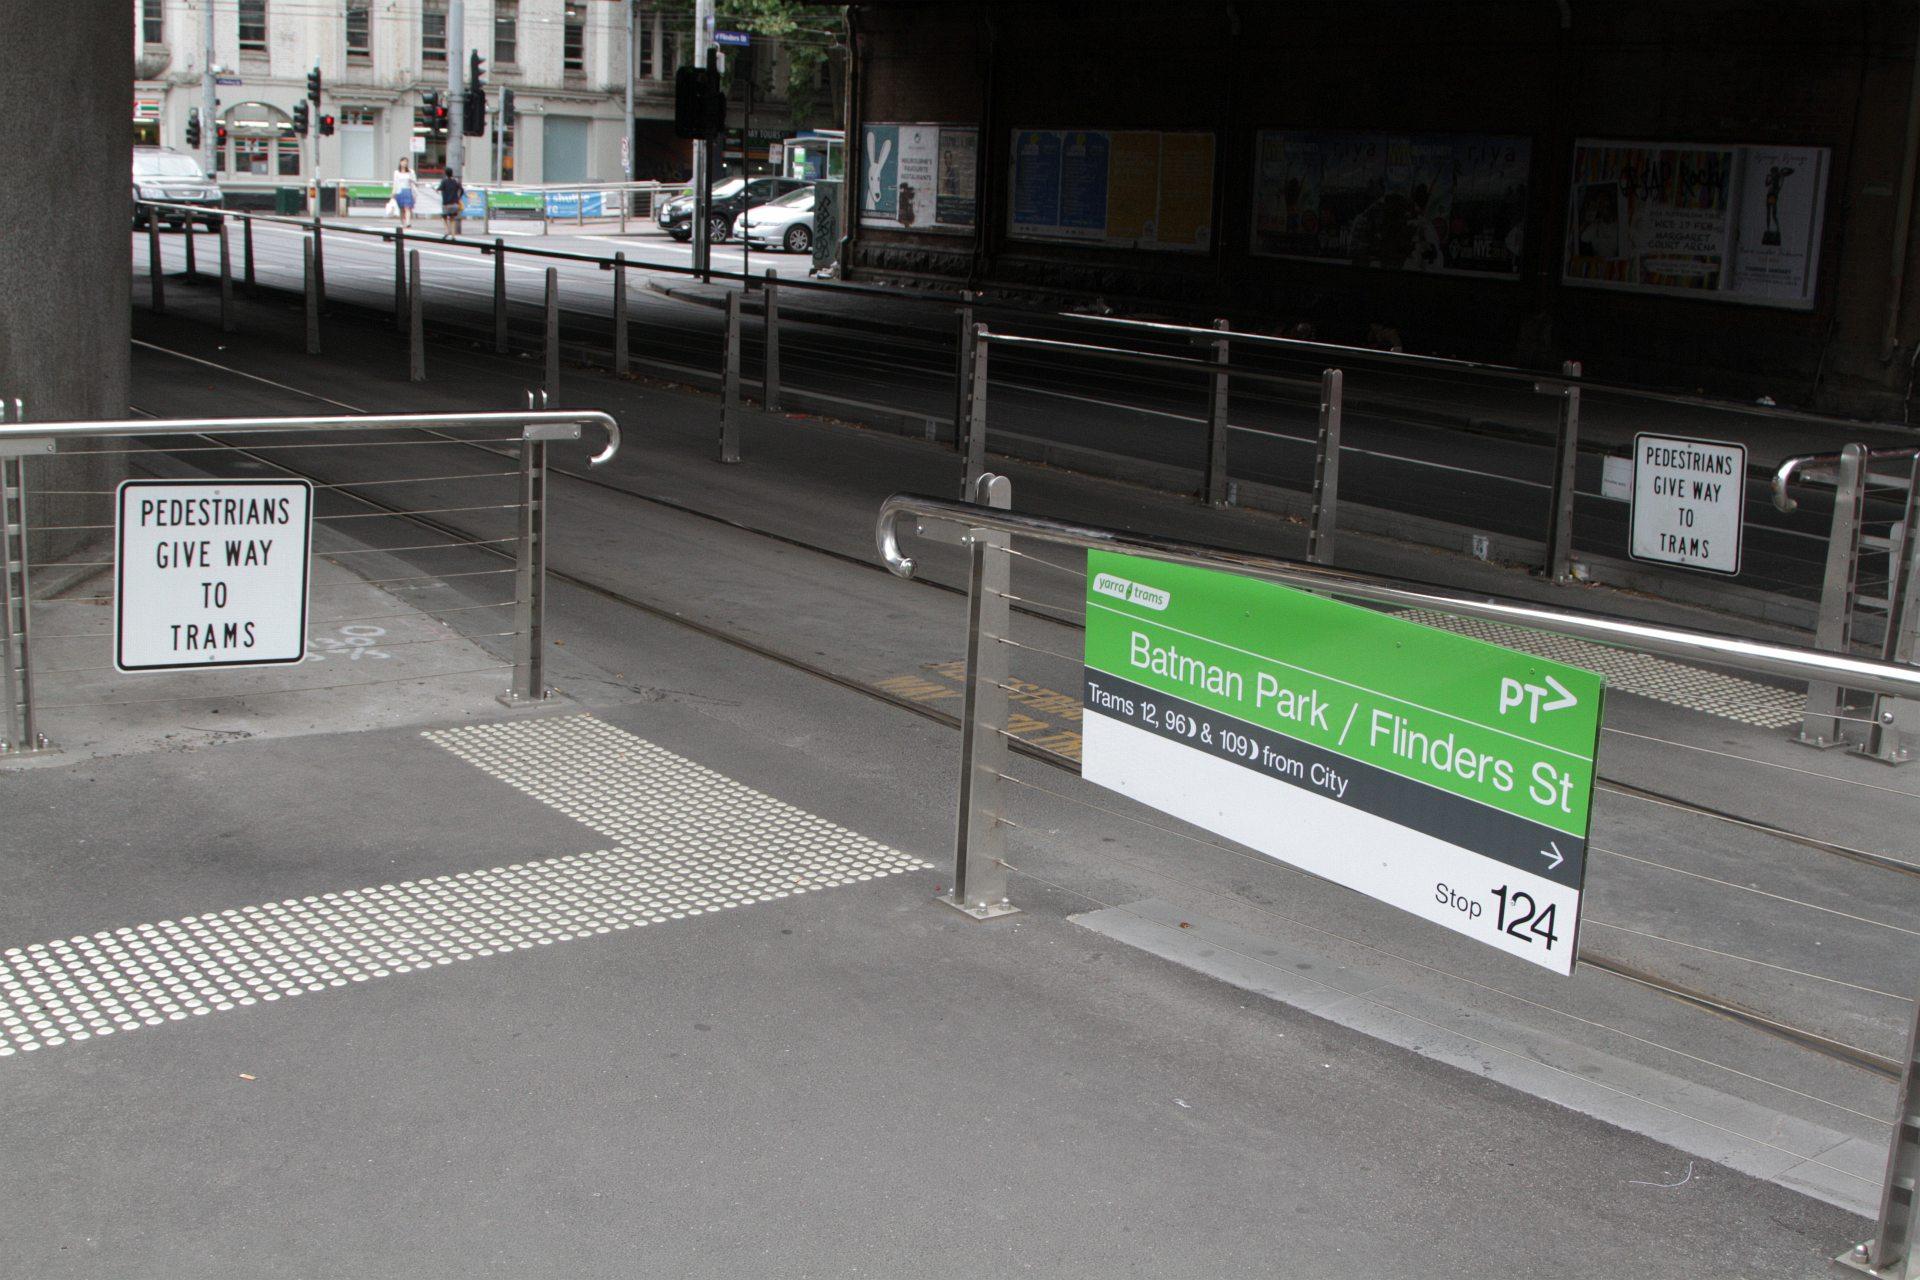 Naked tram stopped caption